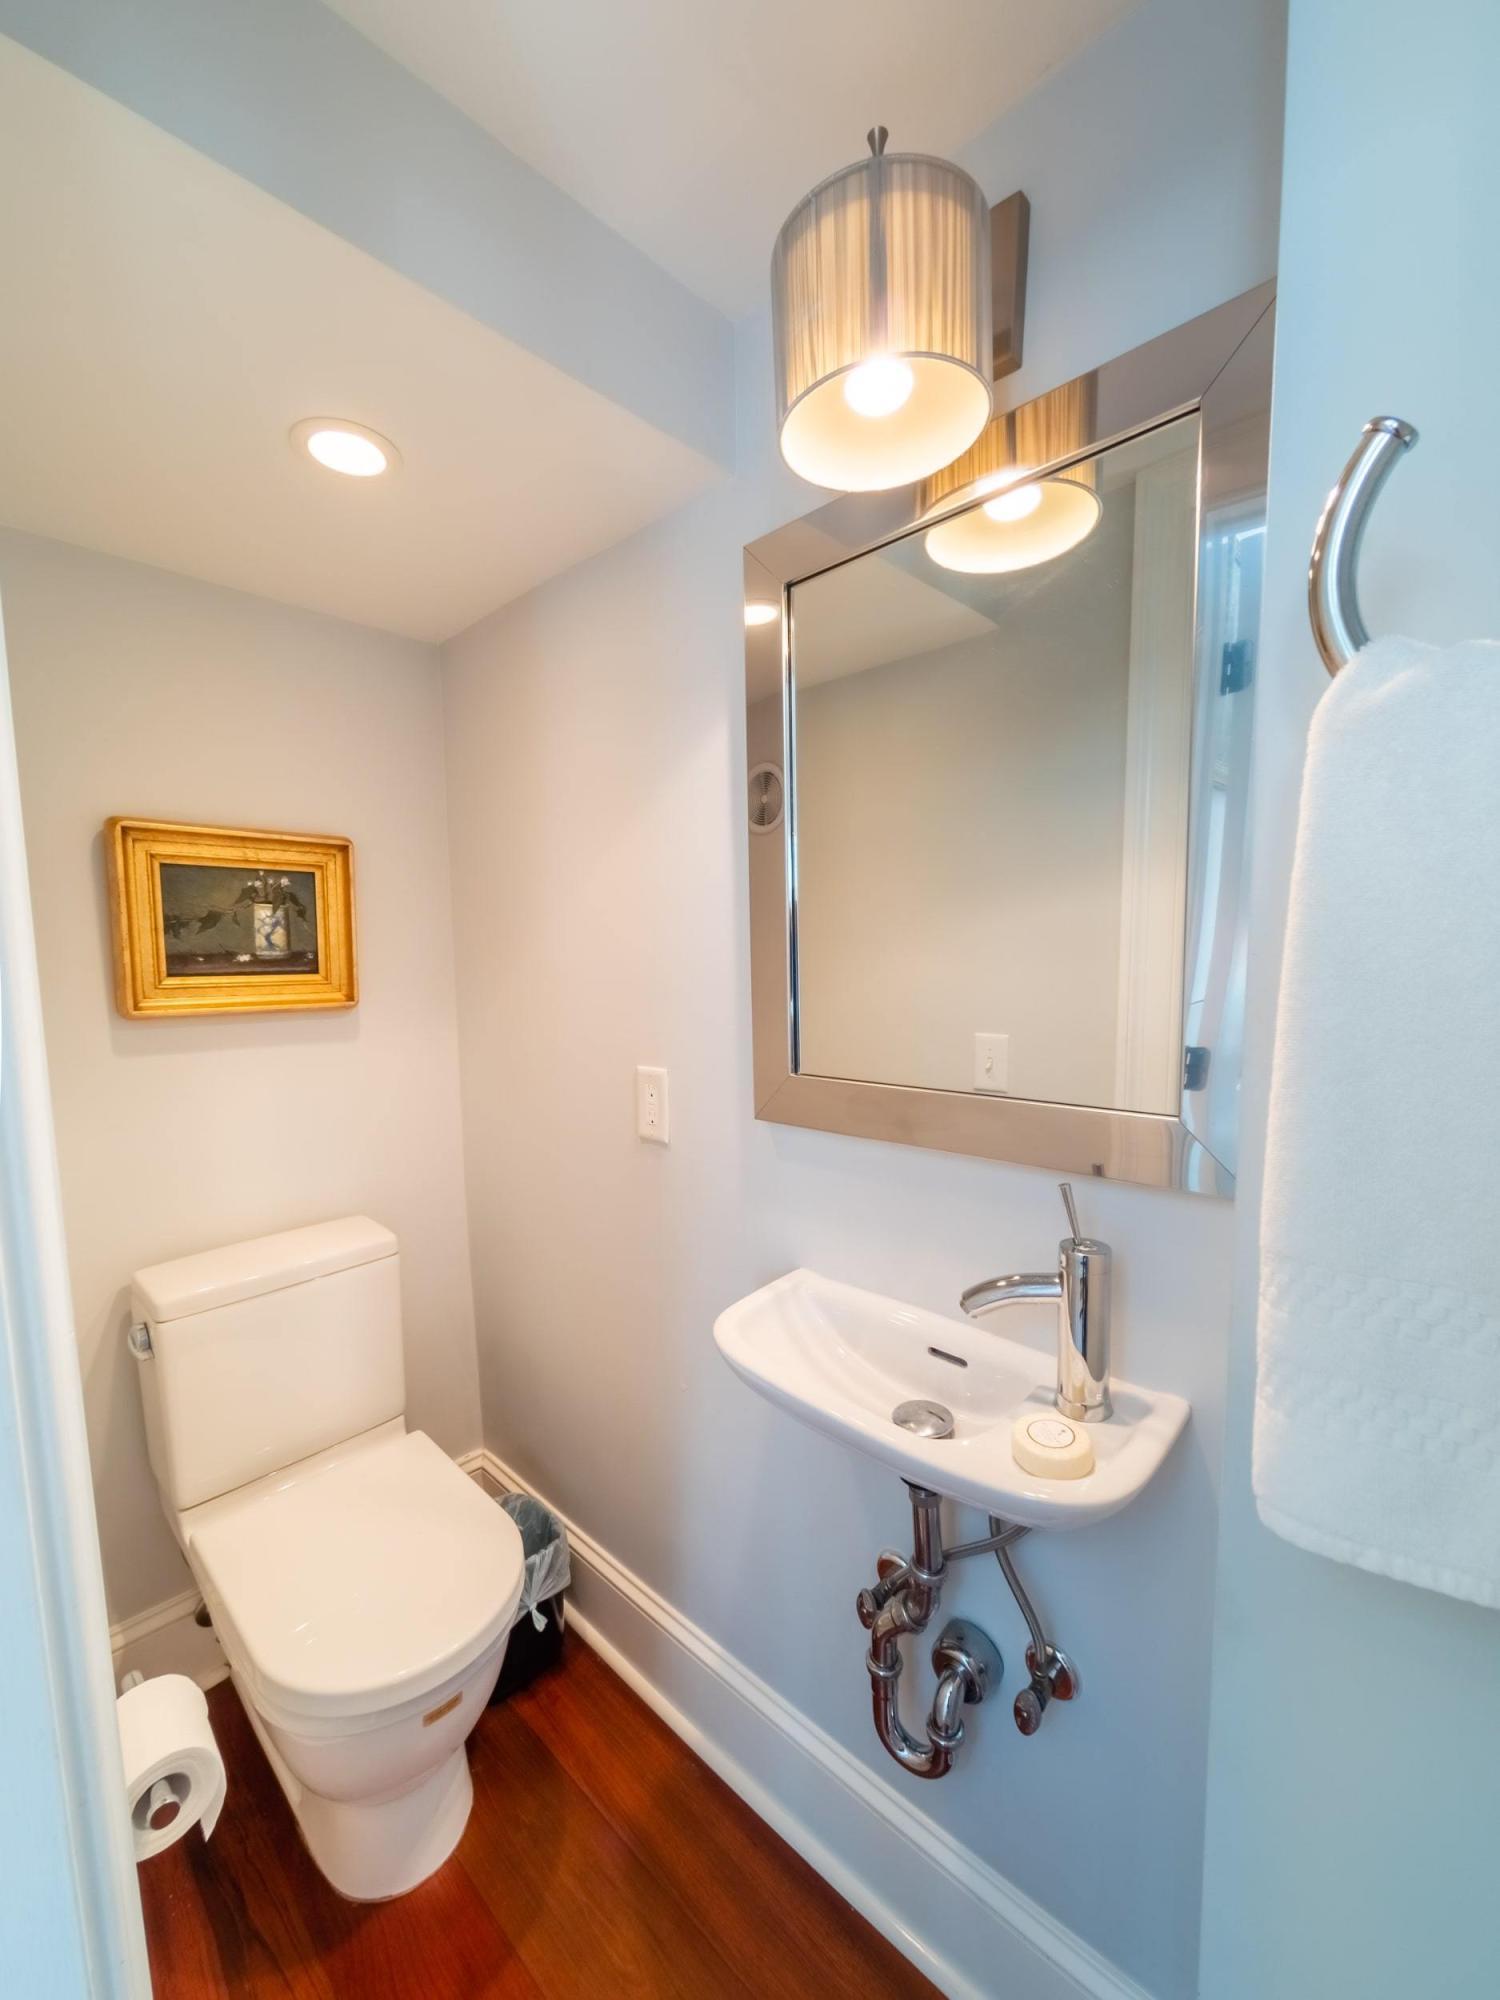 Harleston Village Homes For Sale - 7 Pitt, Charleston, SC - 3